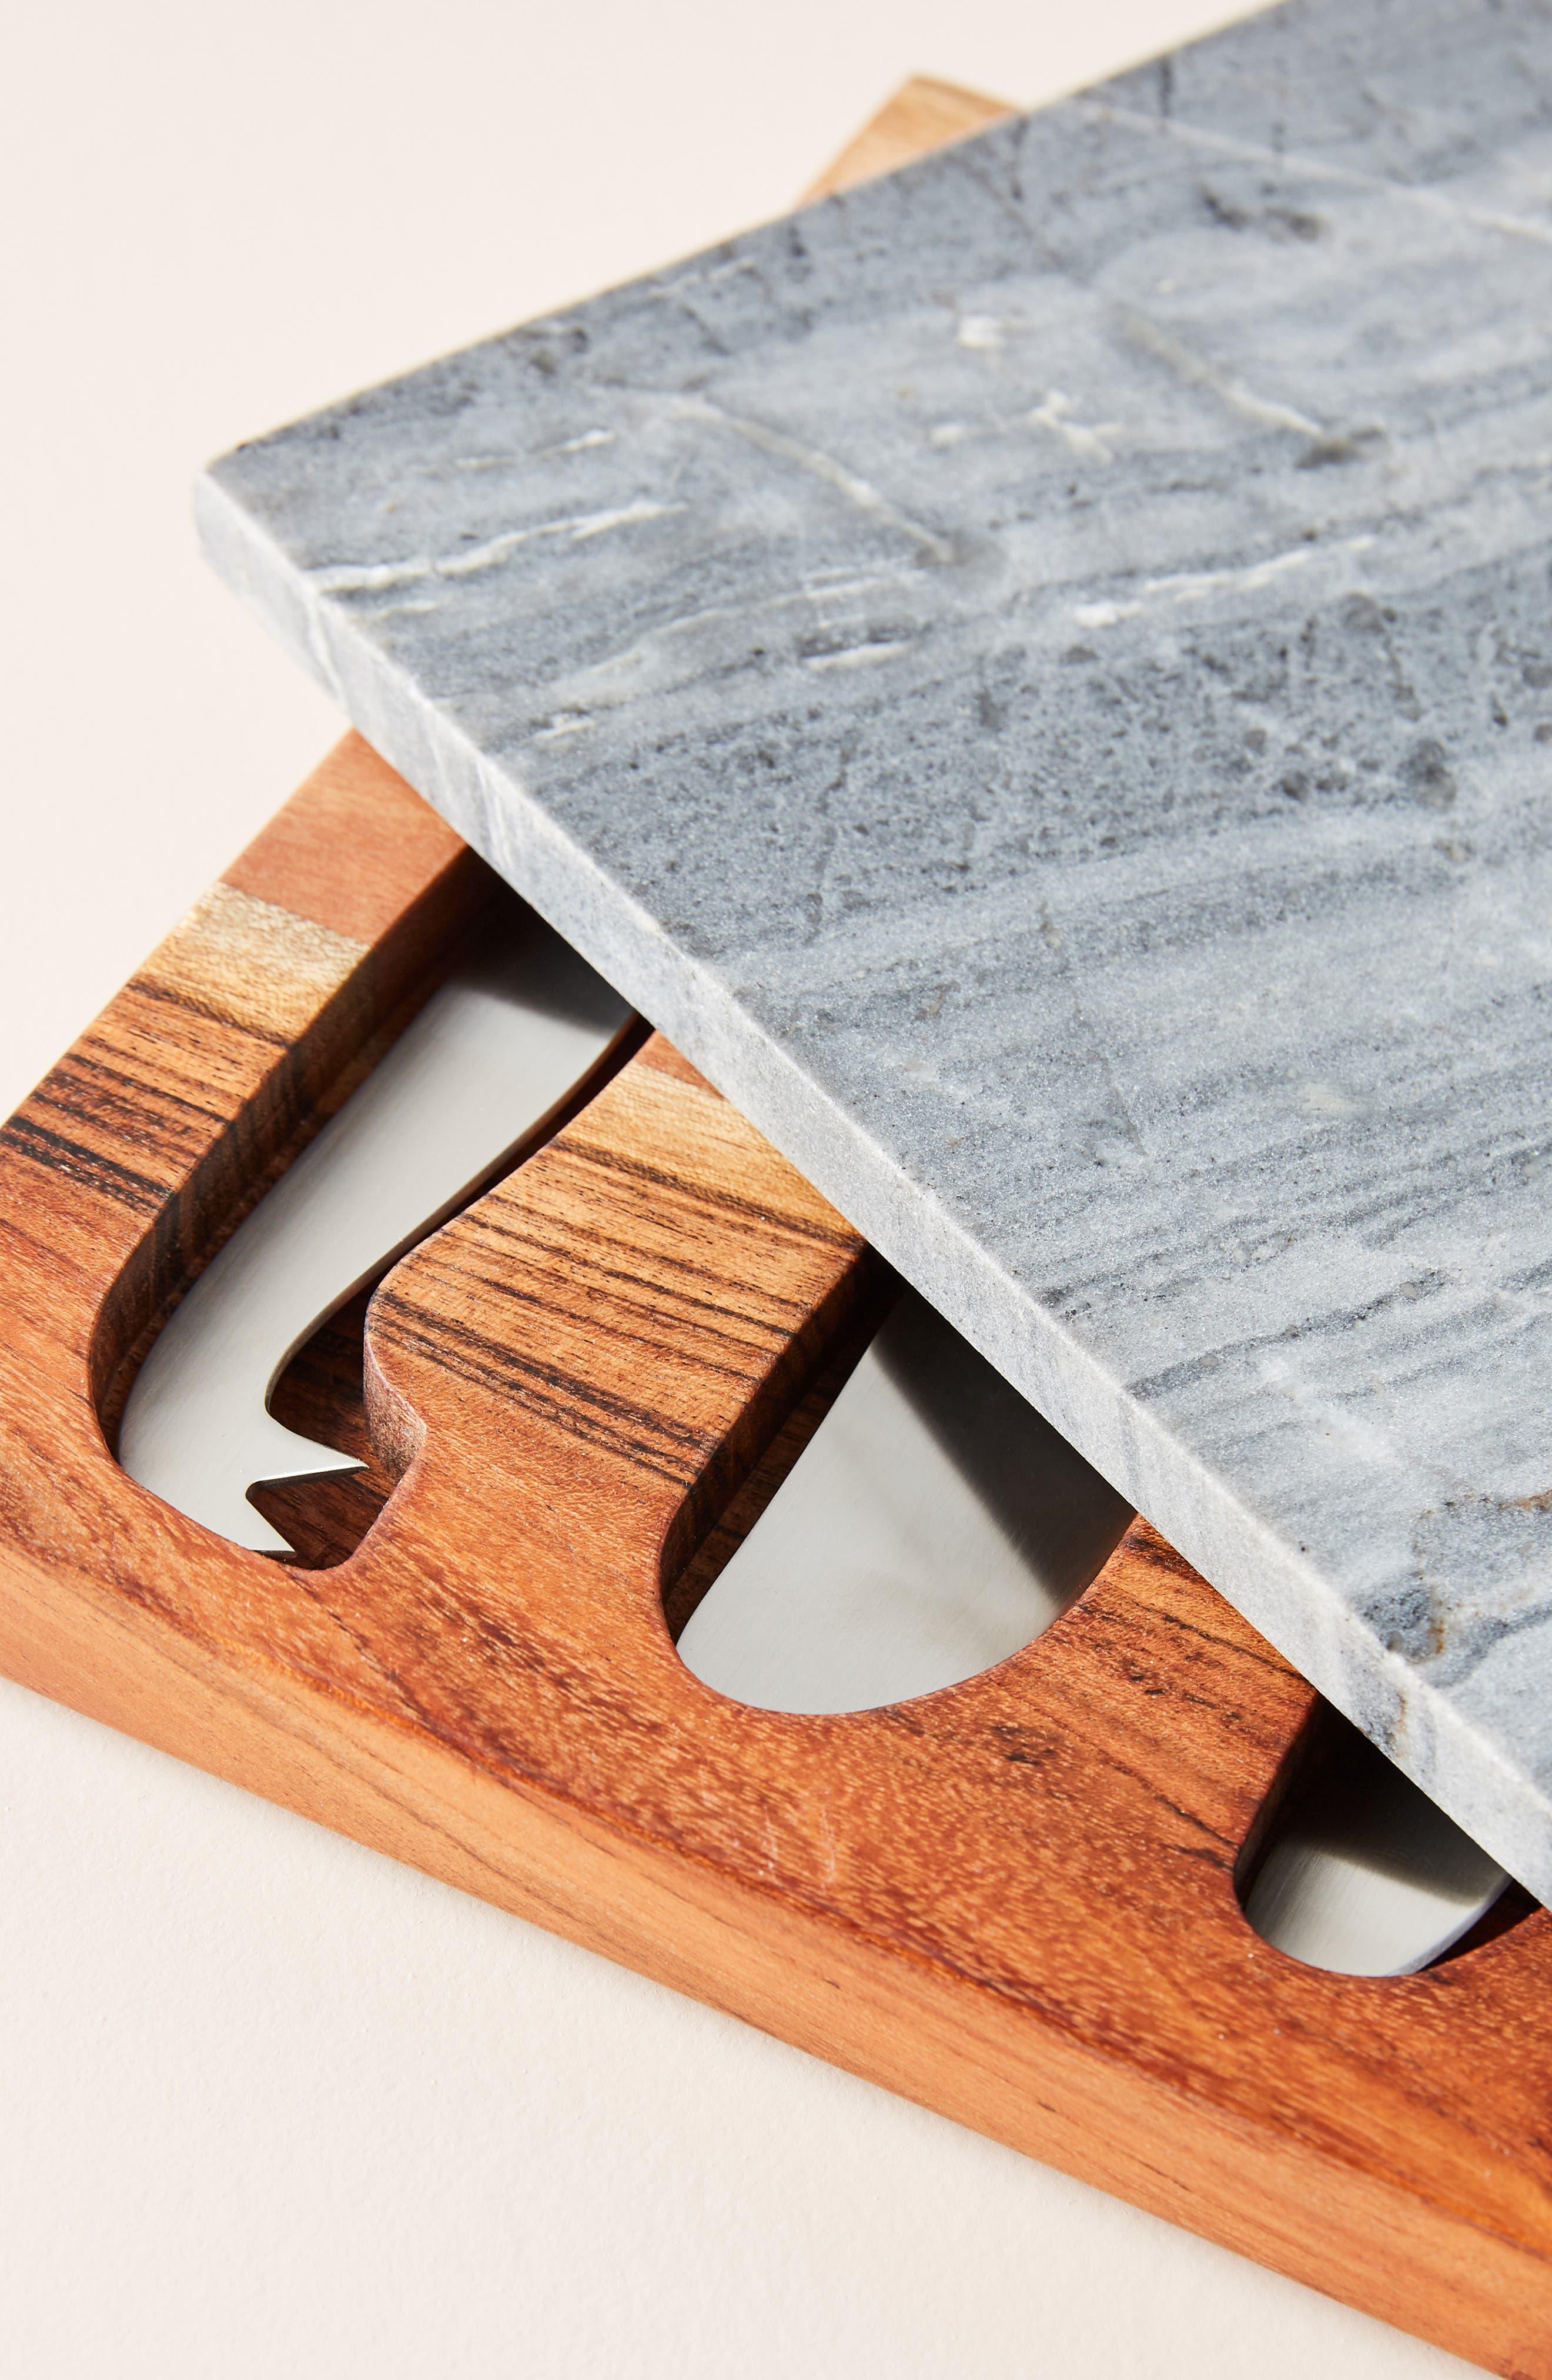 Swivel Cheeseboard & Set of 3 Knives,                             Alternate thumbnail 2, color,                             020